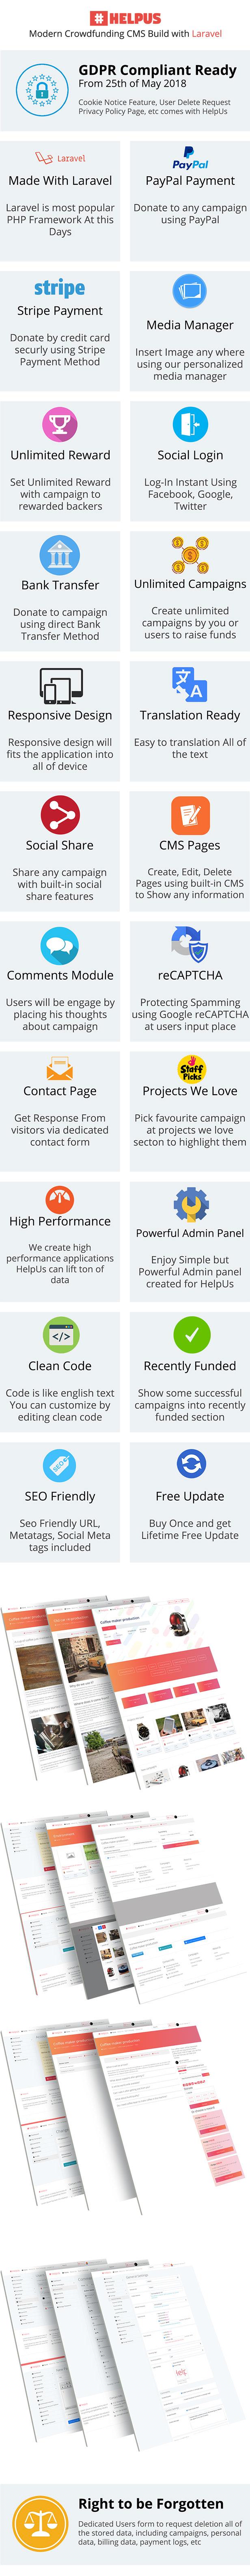 HelpUs - Ultimate Crowdfunding Solution - 1